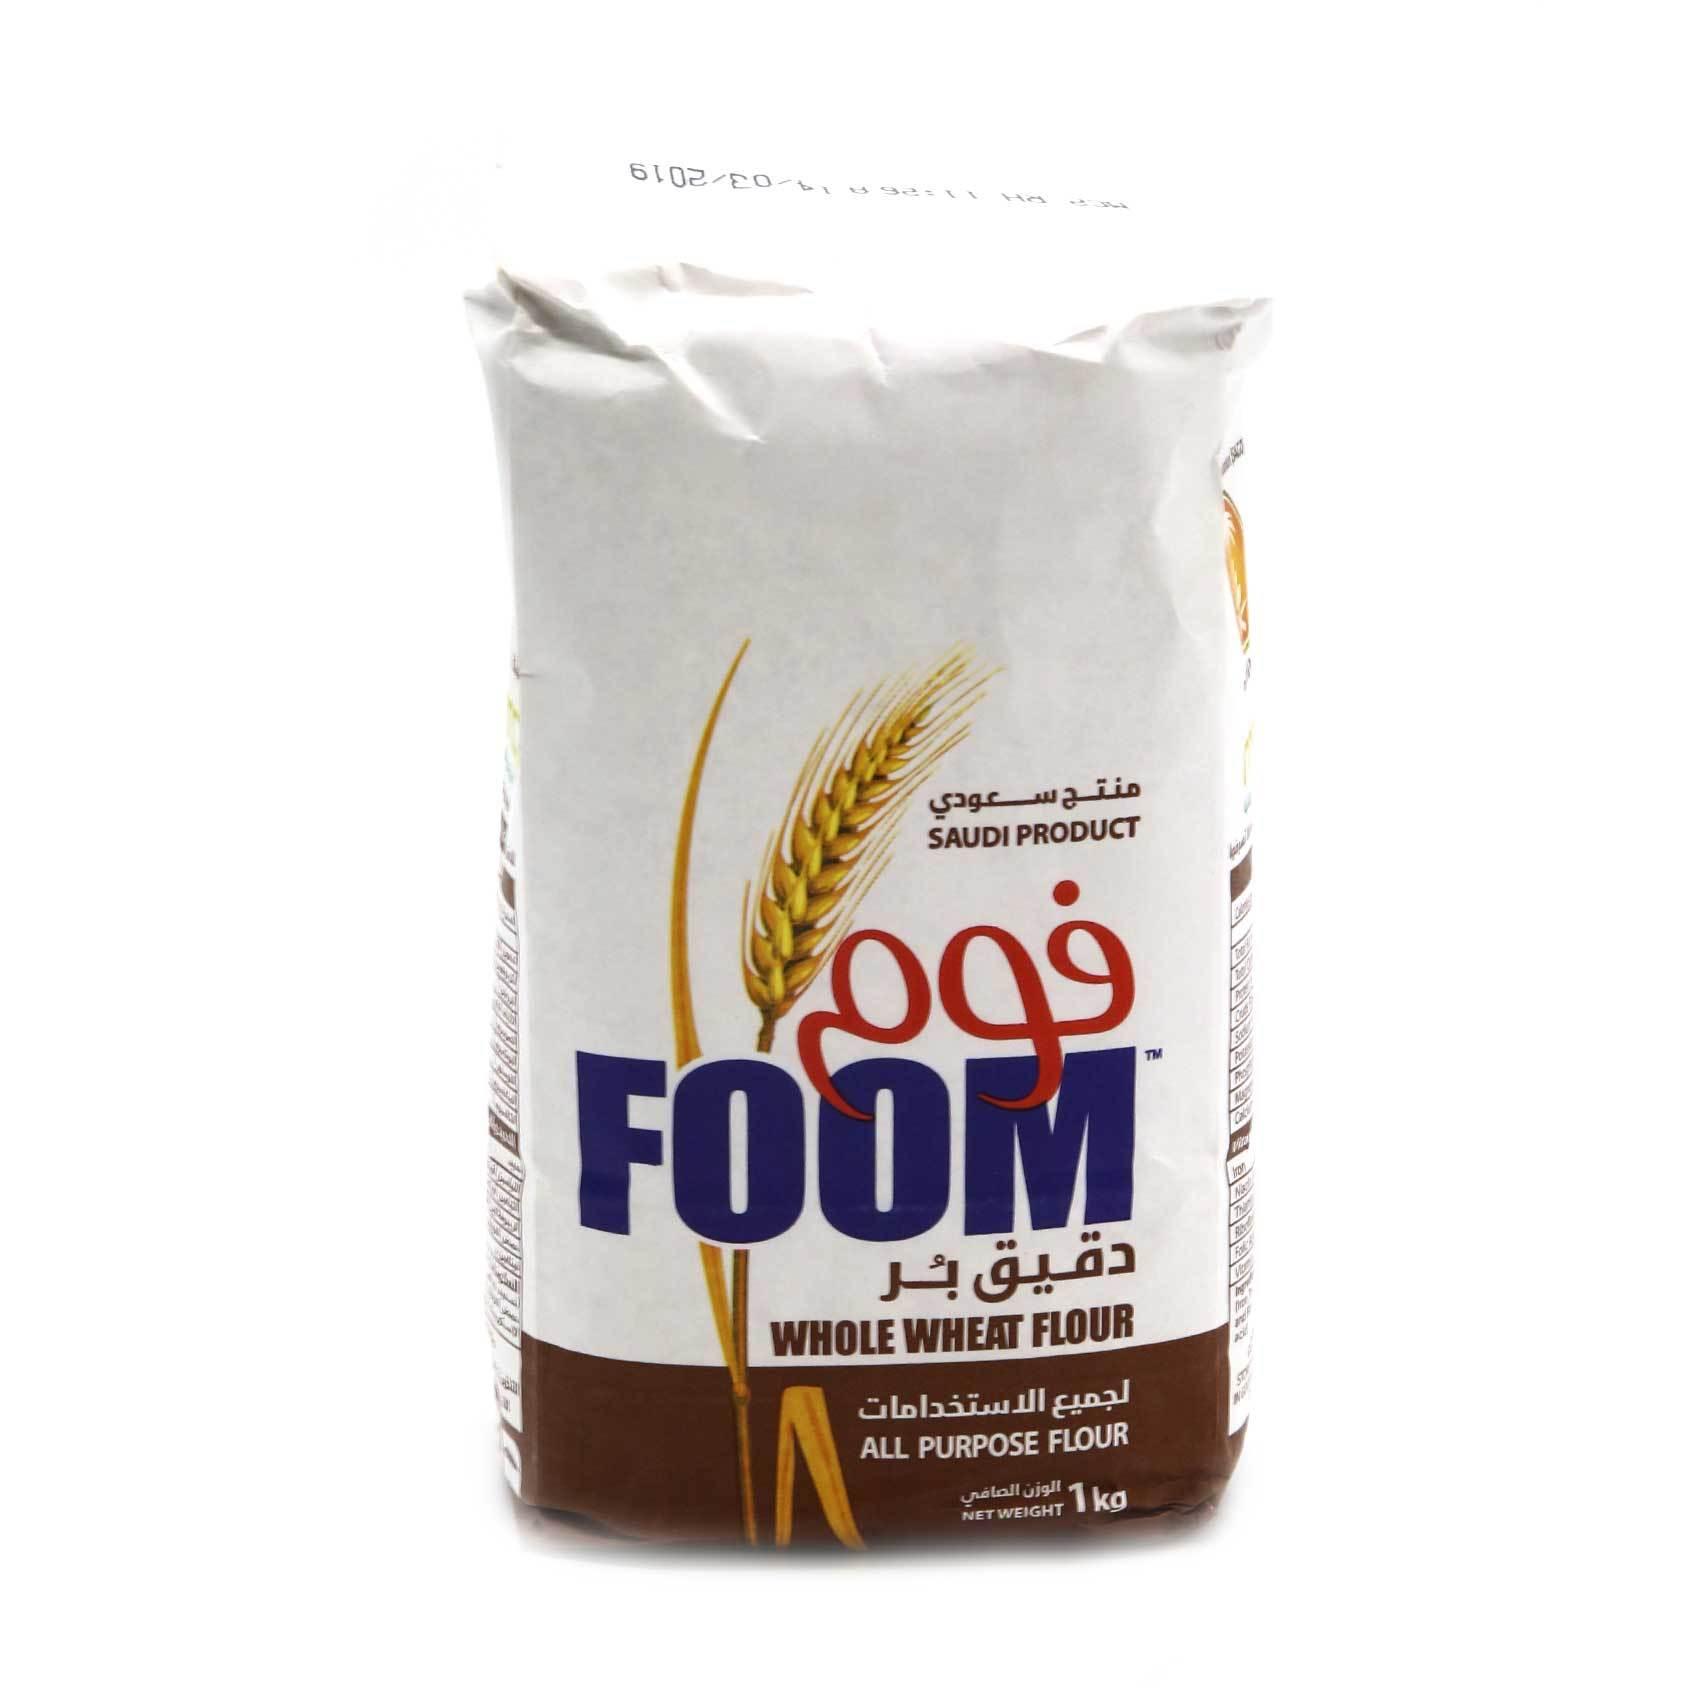 Buy Foom Whole Wheat Flour 1 Kg Online Shop Food Cupboard On Carrefour Saudi Arabia